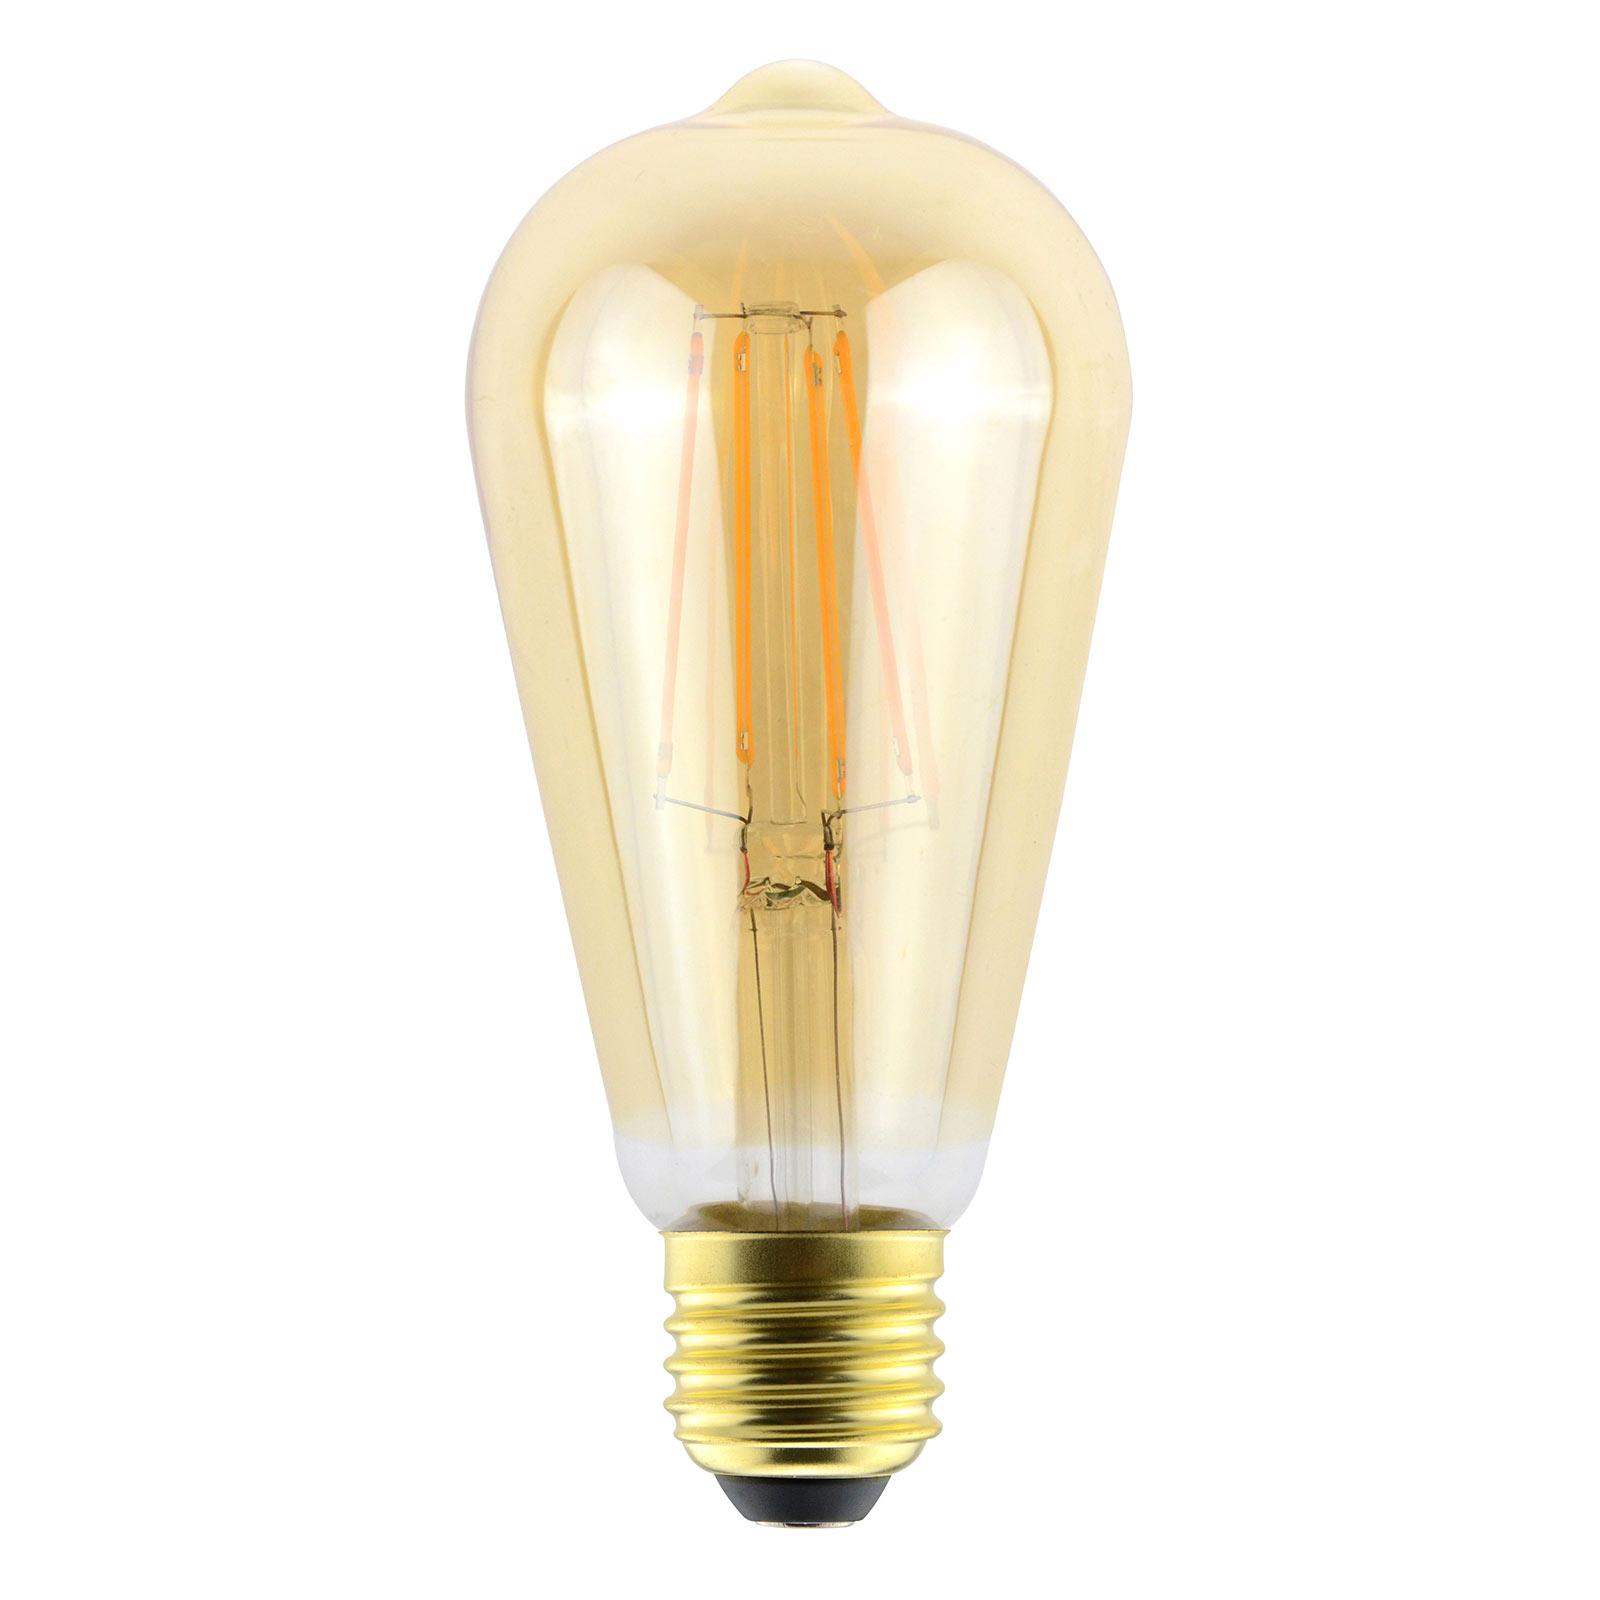 LED-Lampe E27 ToLEDo RT ST64 6W 825 gold dimmbar